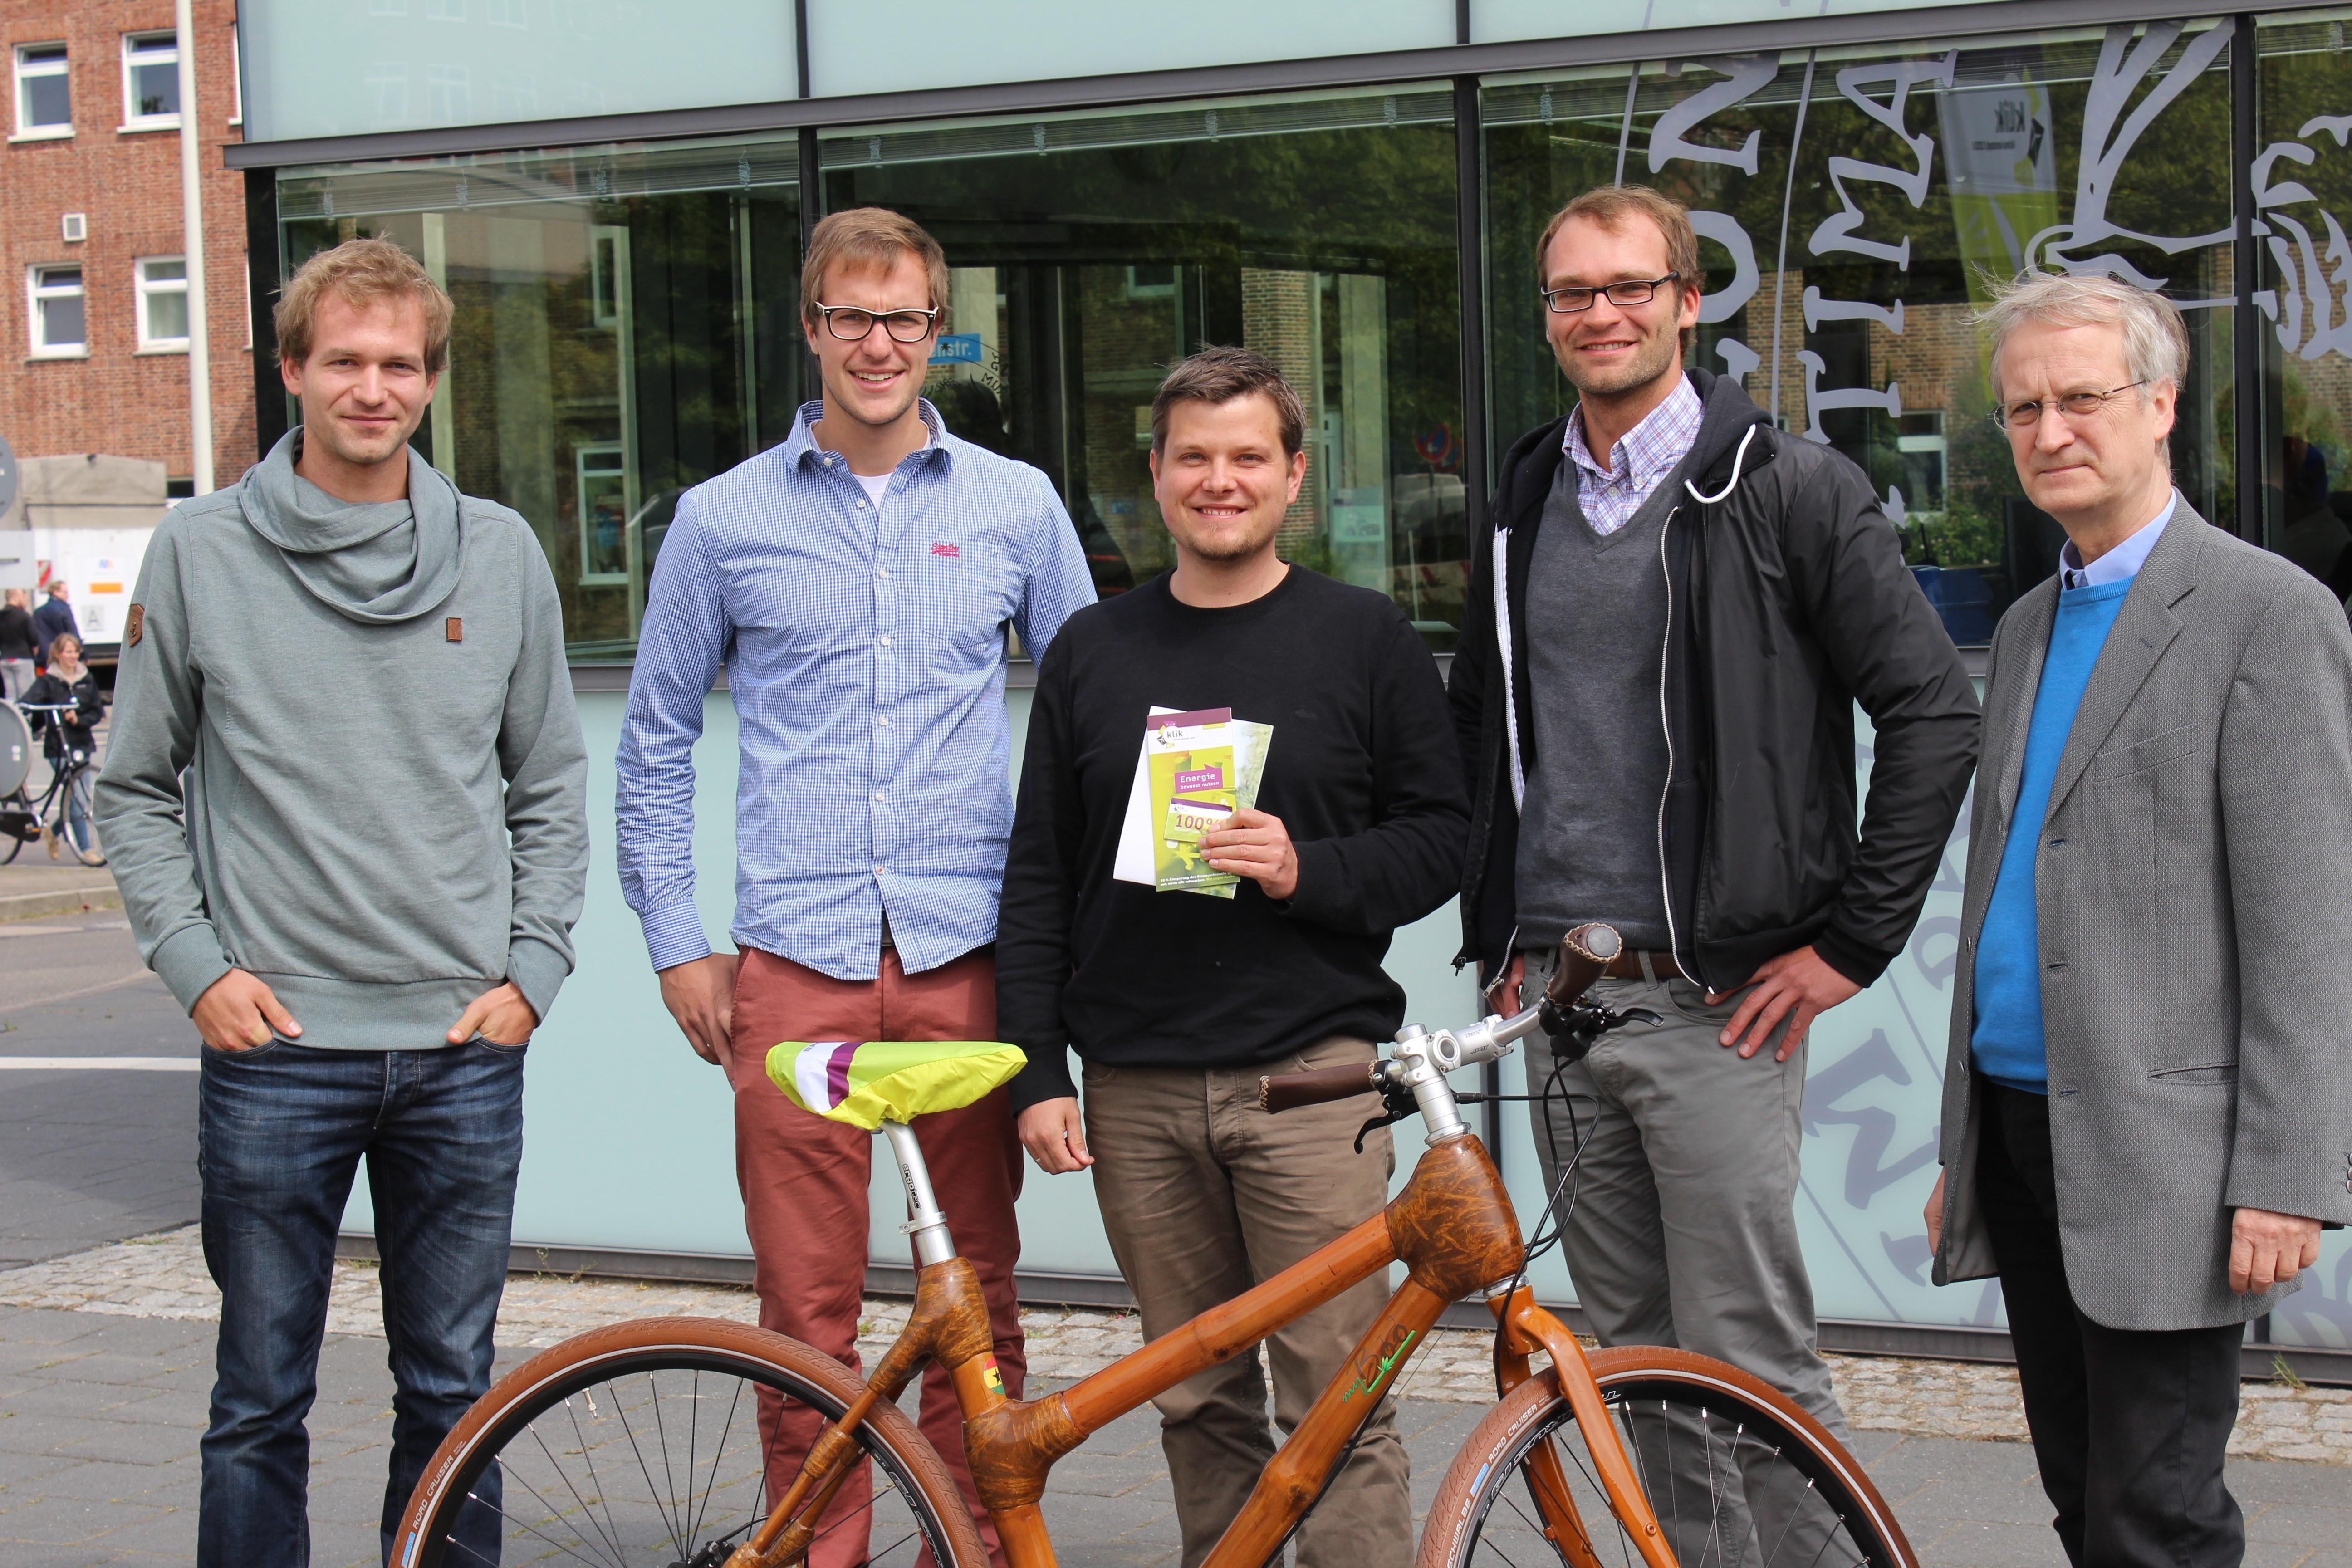 Uni Kiel Alles Richtig Gemacht Bambusfahrrad Fur Gewinner Des Cau